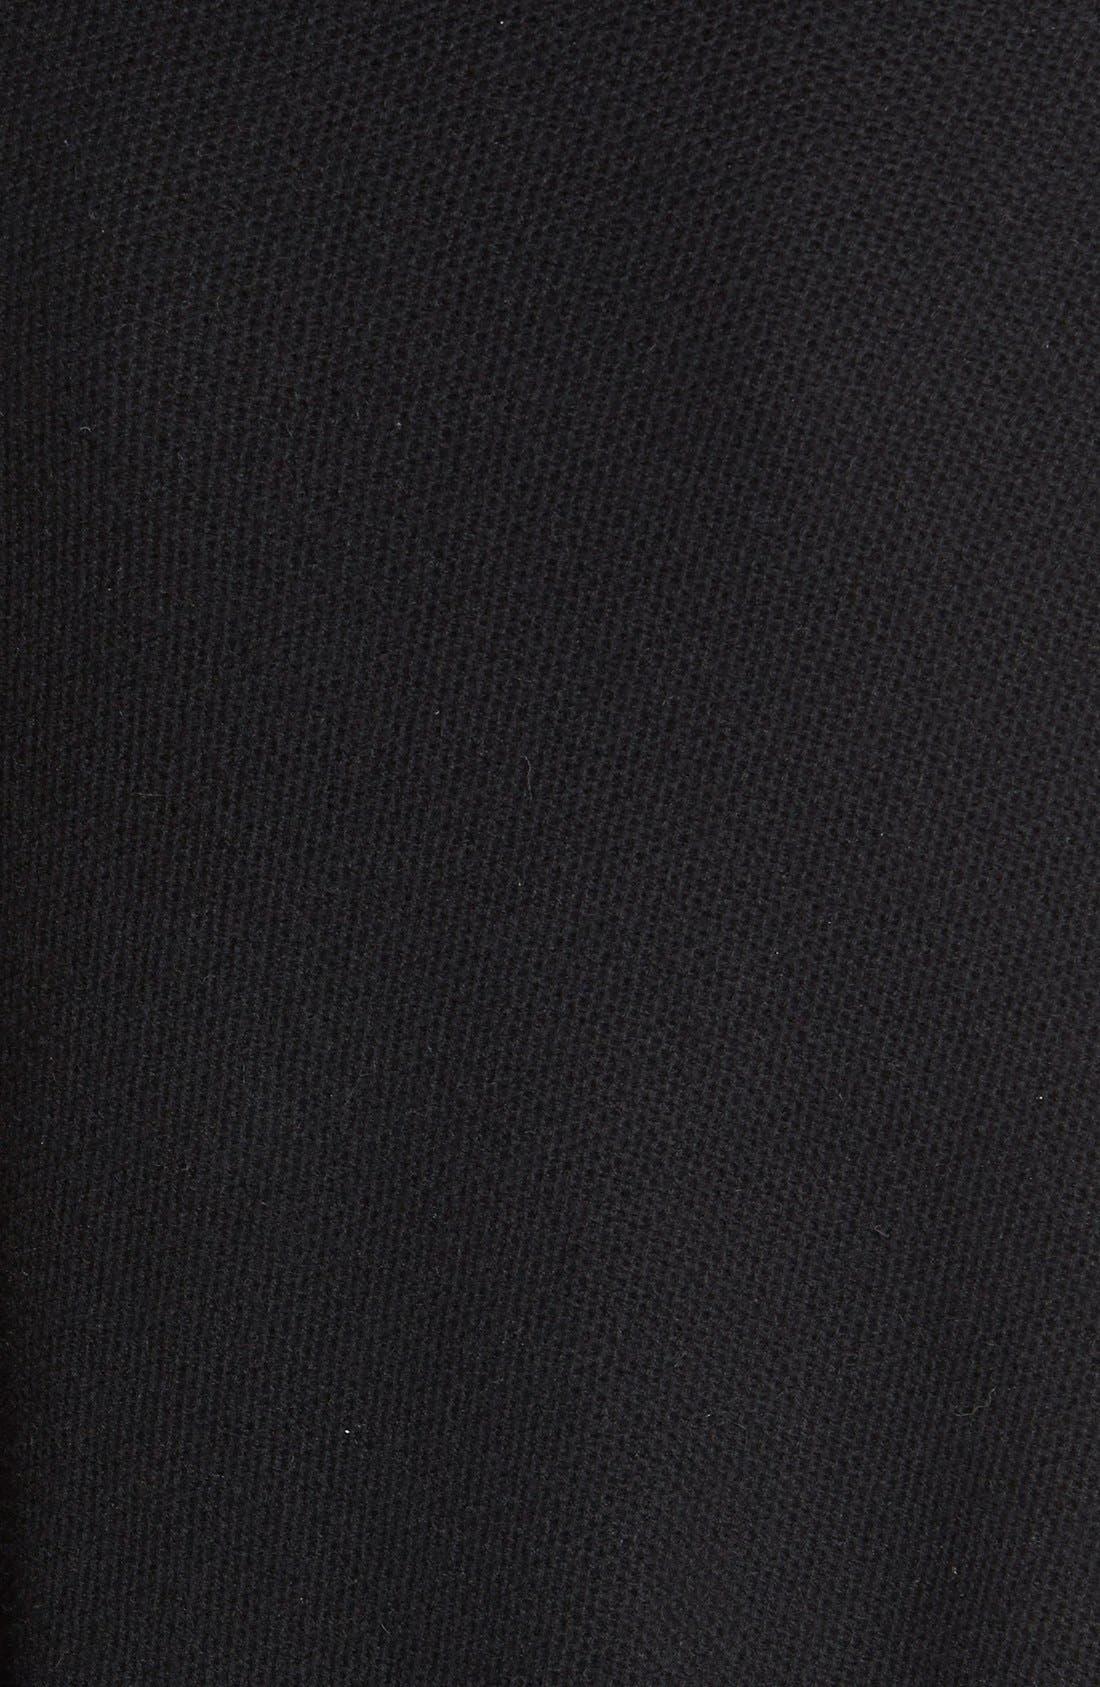 JOIE,                             'Loysse' Wool & Cashmere Cowl Neck Sweater,                             Alternate thumbnail 3, color,                             002